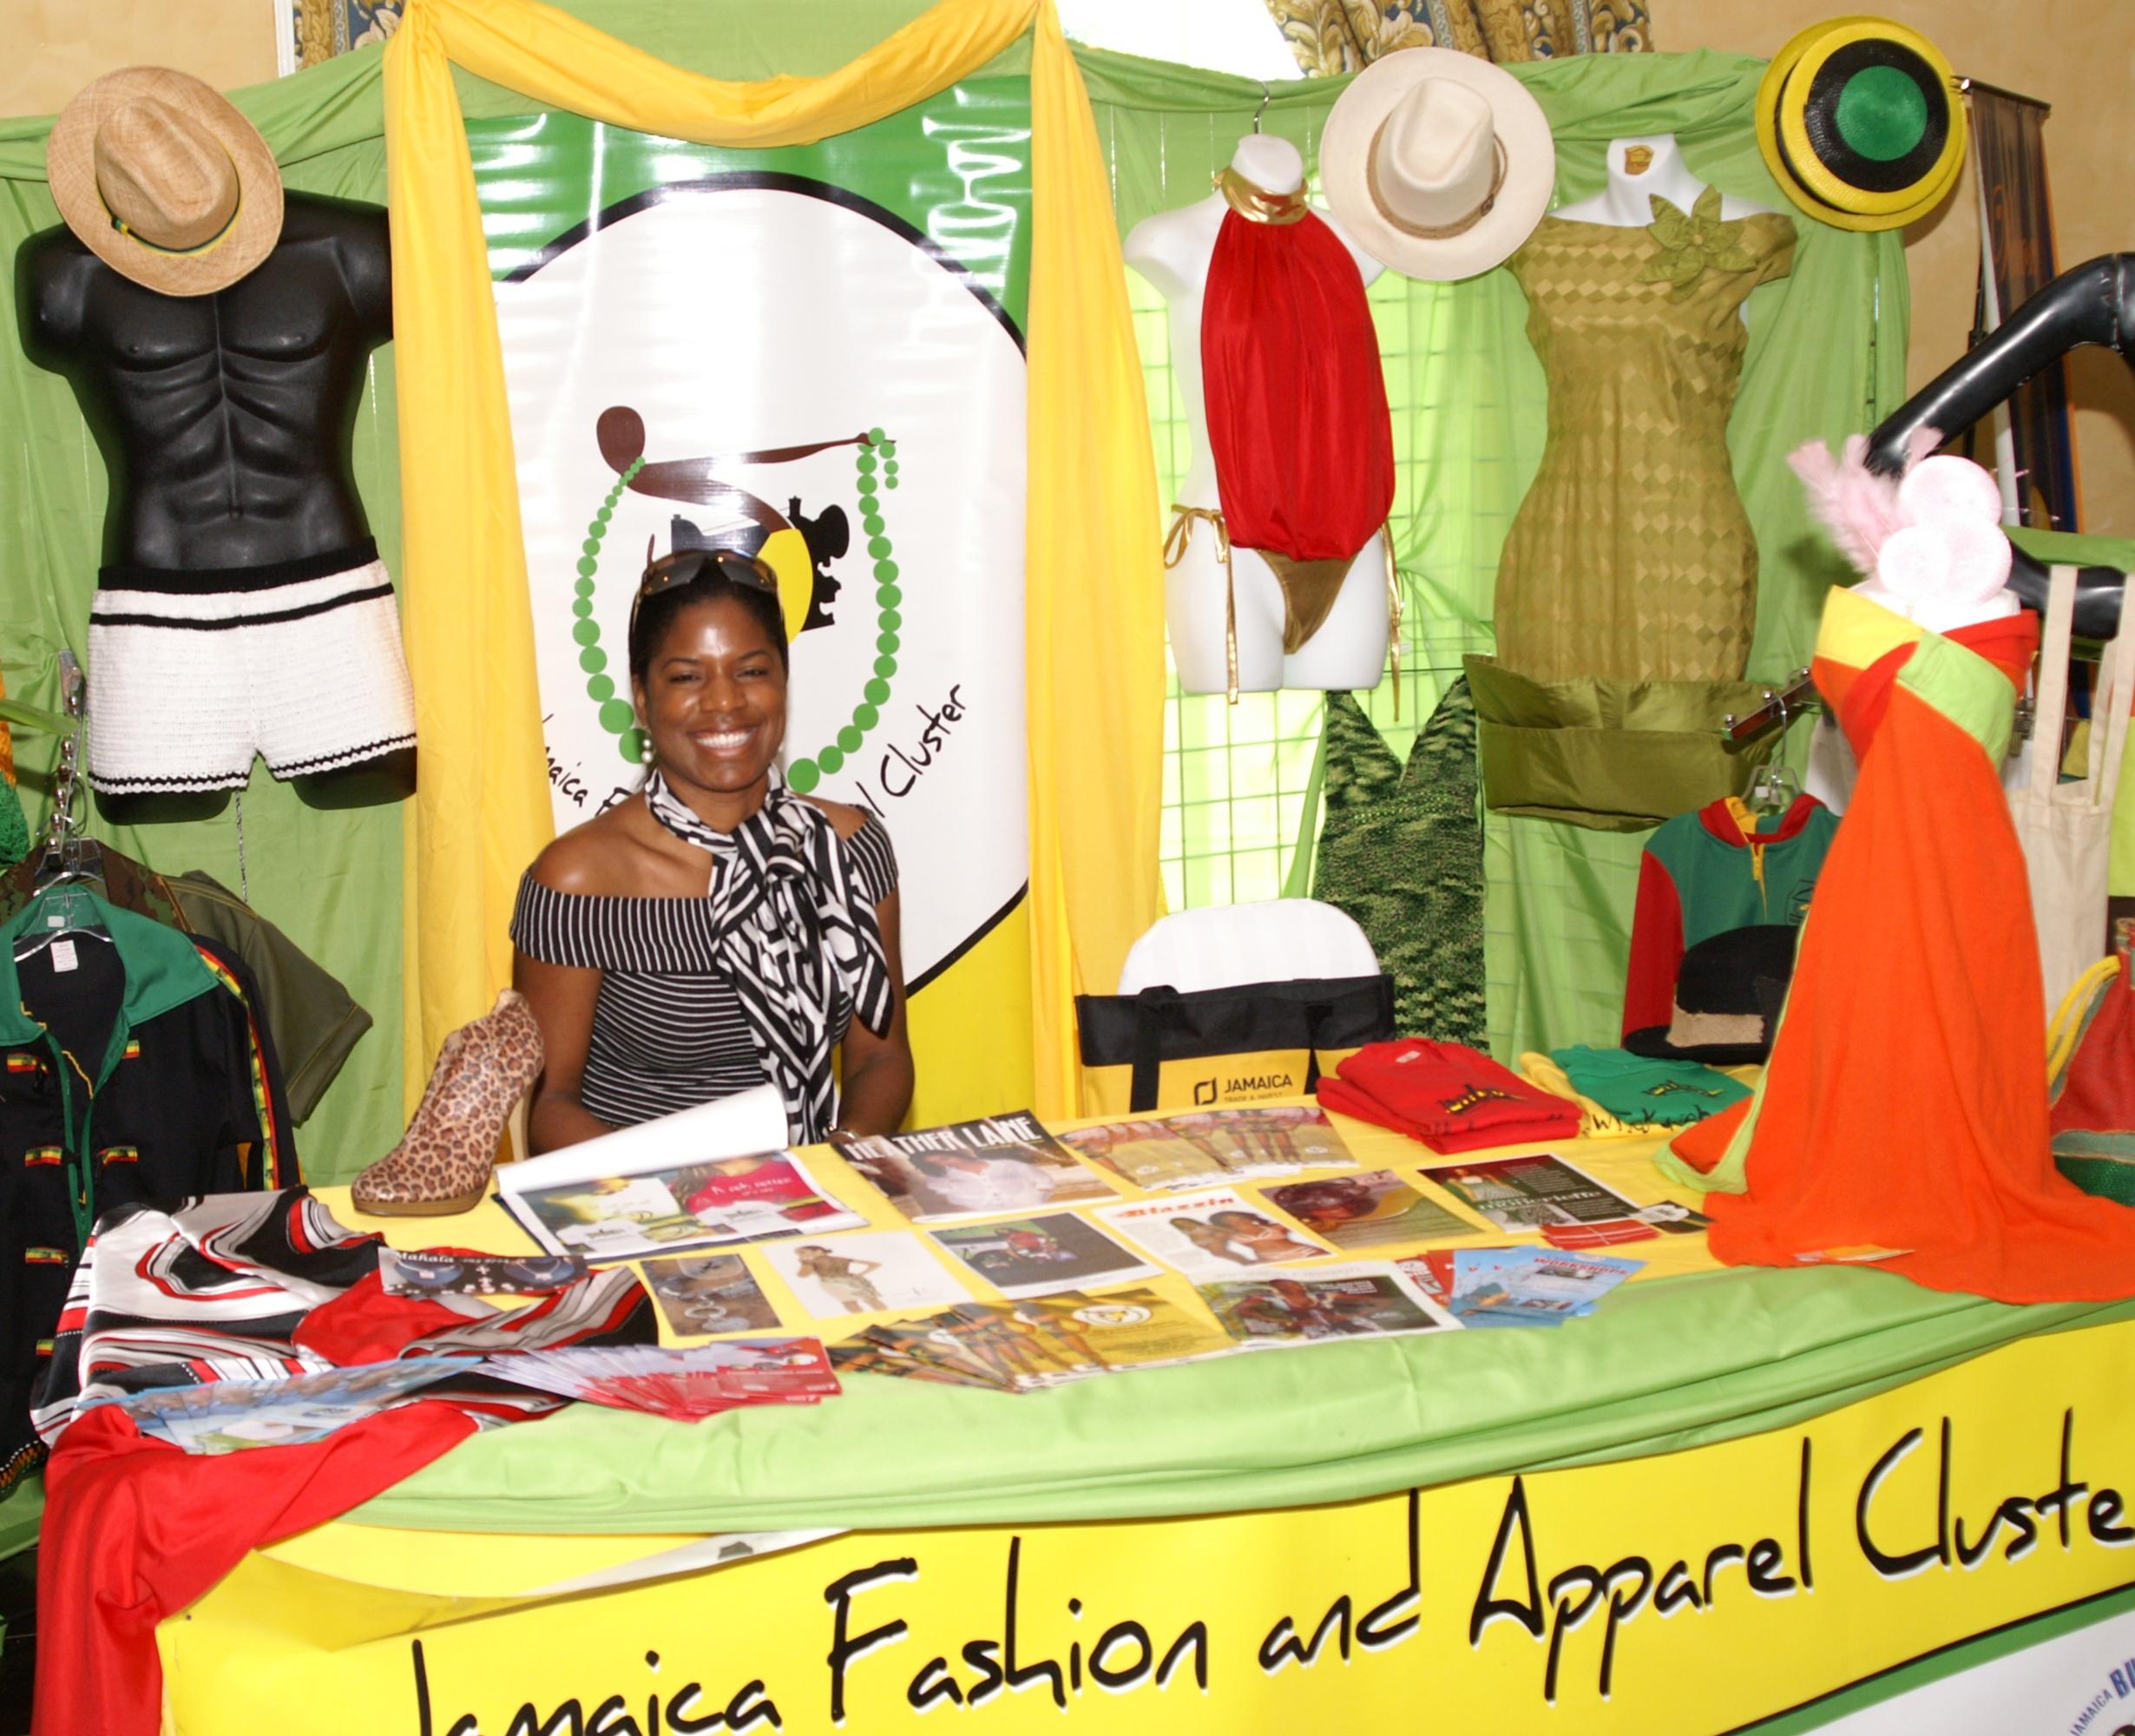 Jamaican Fashion & Apparel!